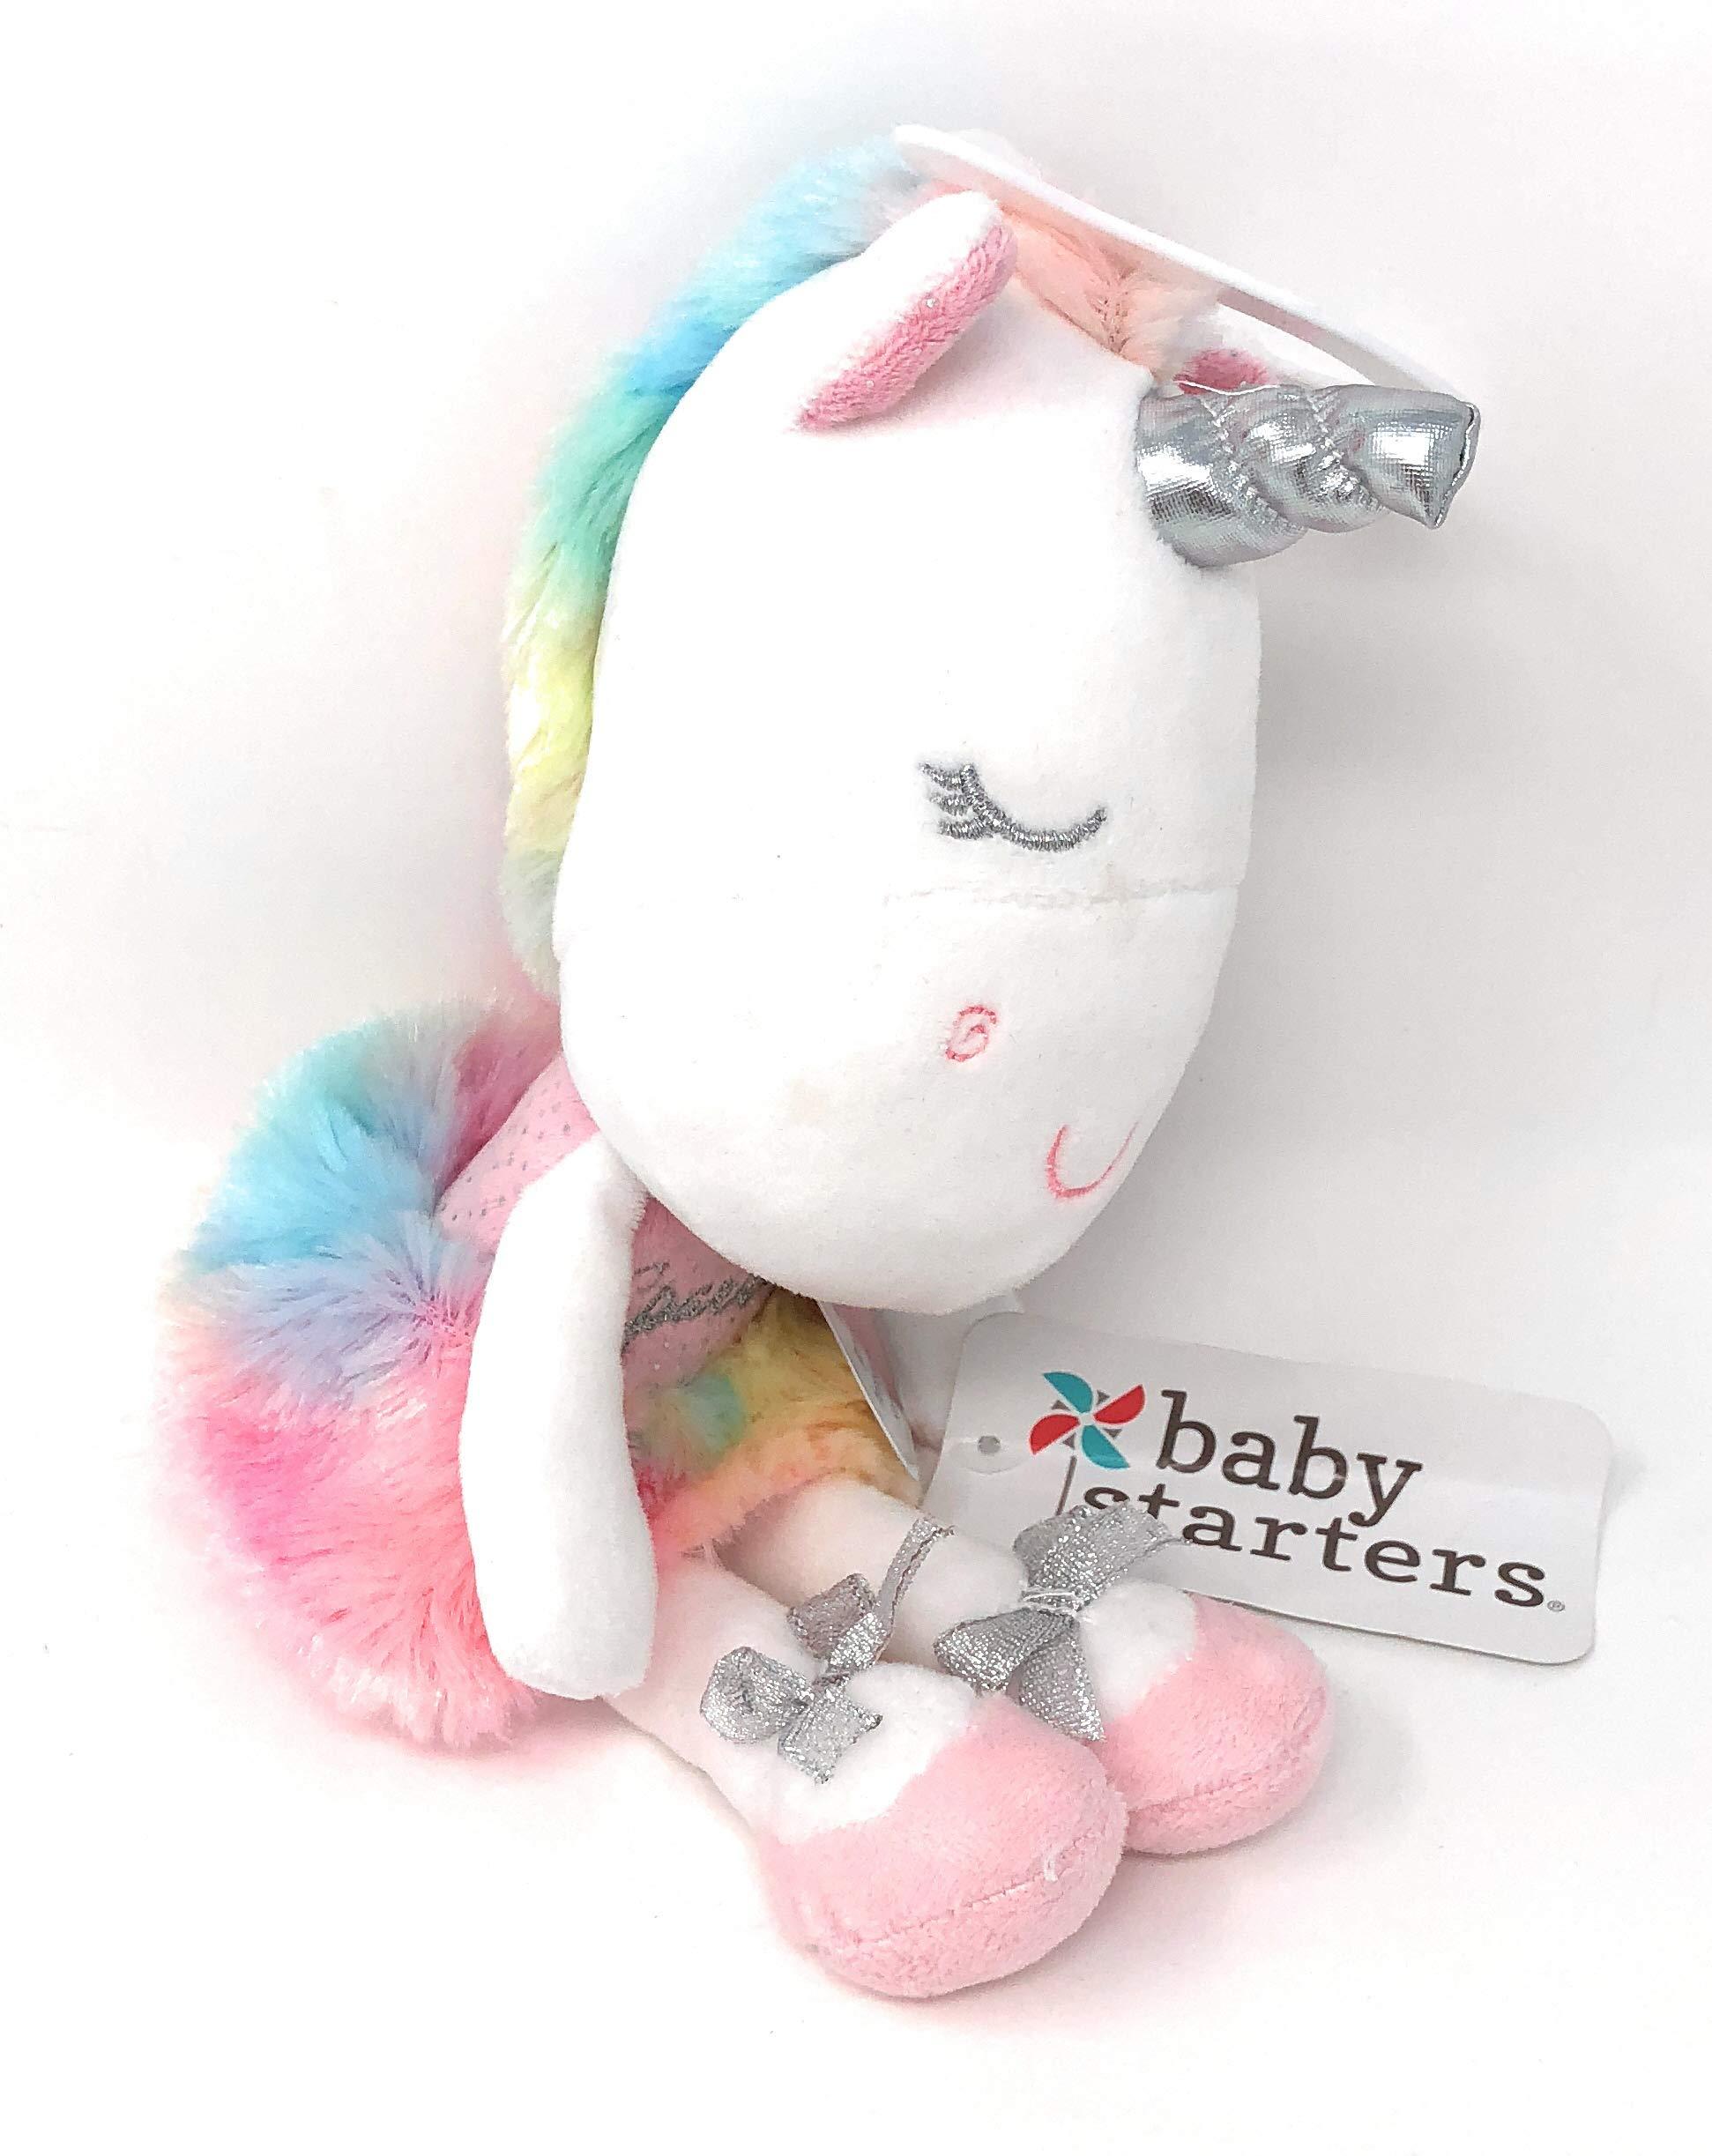 Baby Starters Ballet Tutu Rainbow Plush Unicorn ~ Dancing Ballerina | Press My Tummy to Hear Sparkle Sound | 12 in Tall by Baby Starters (Image #4)